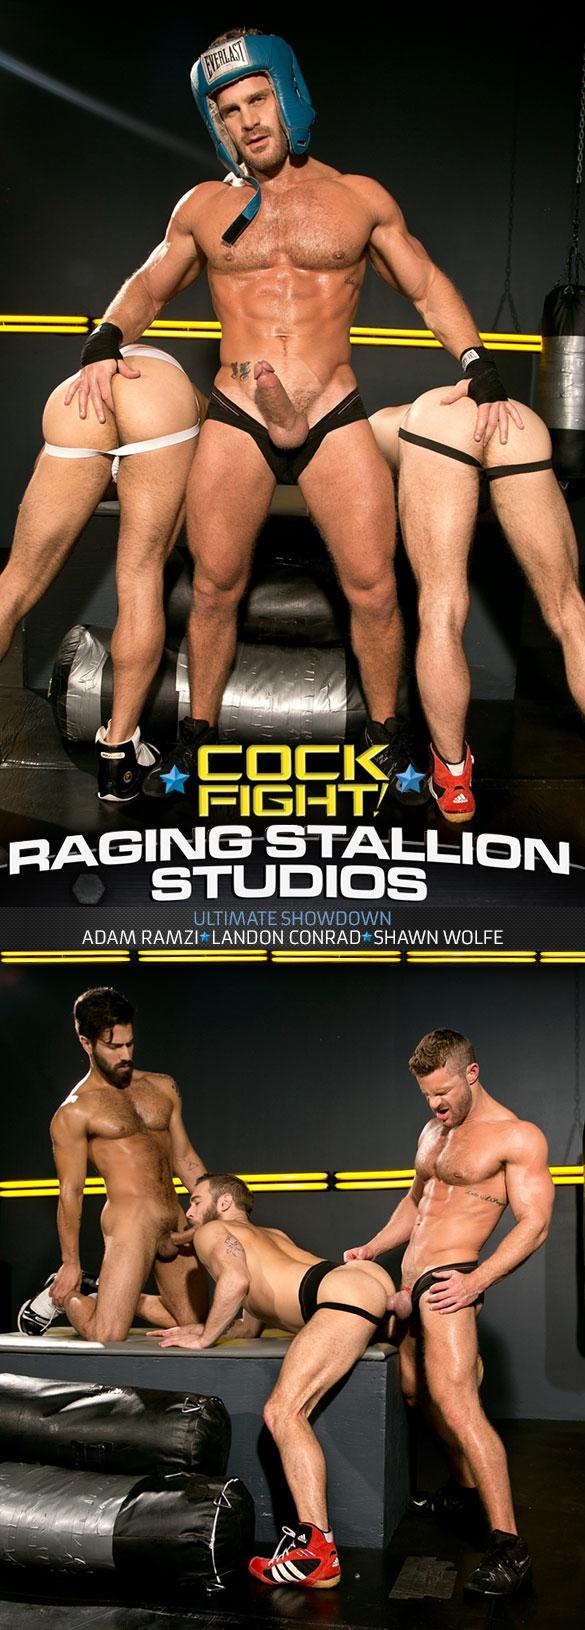 "Raging Stallion: Shawn Wolfe, Adam Ramzi and Landon Conrad in ""Cock Fight!"""